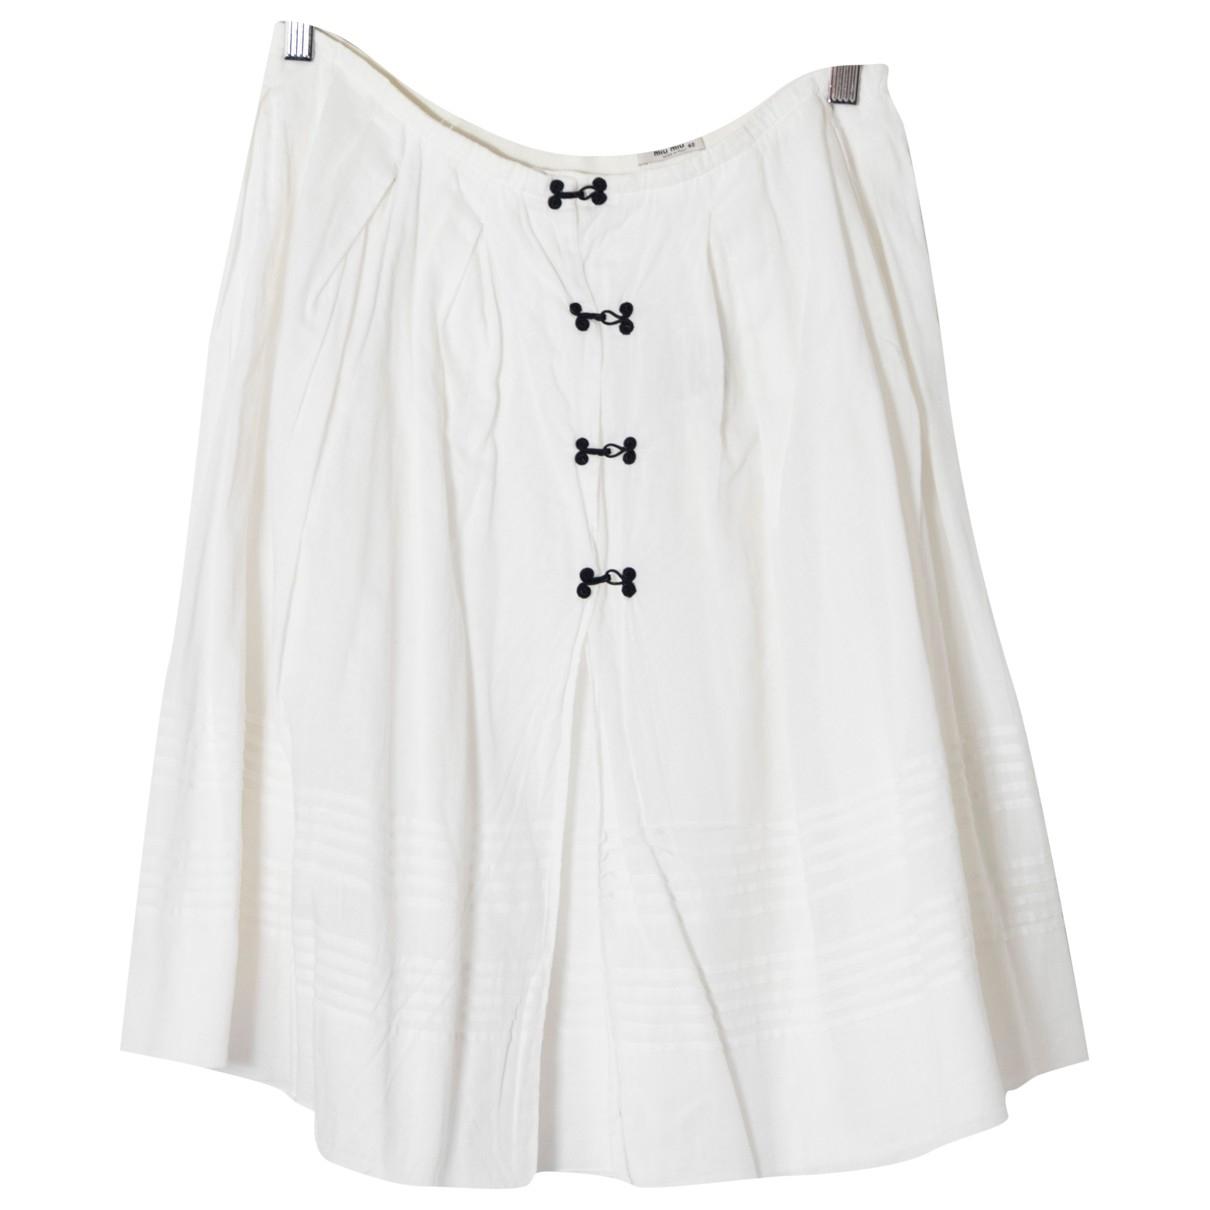 Miu Miu \N White Cotton skirt for Women 40 IT